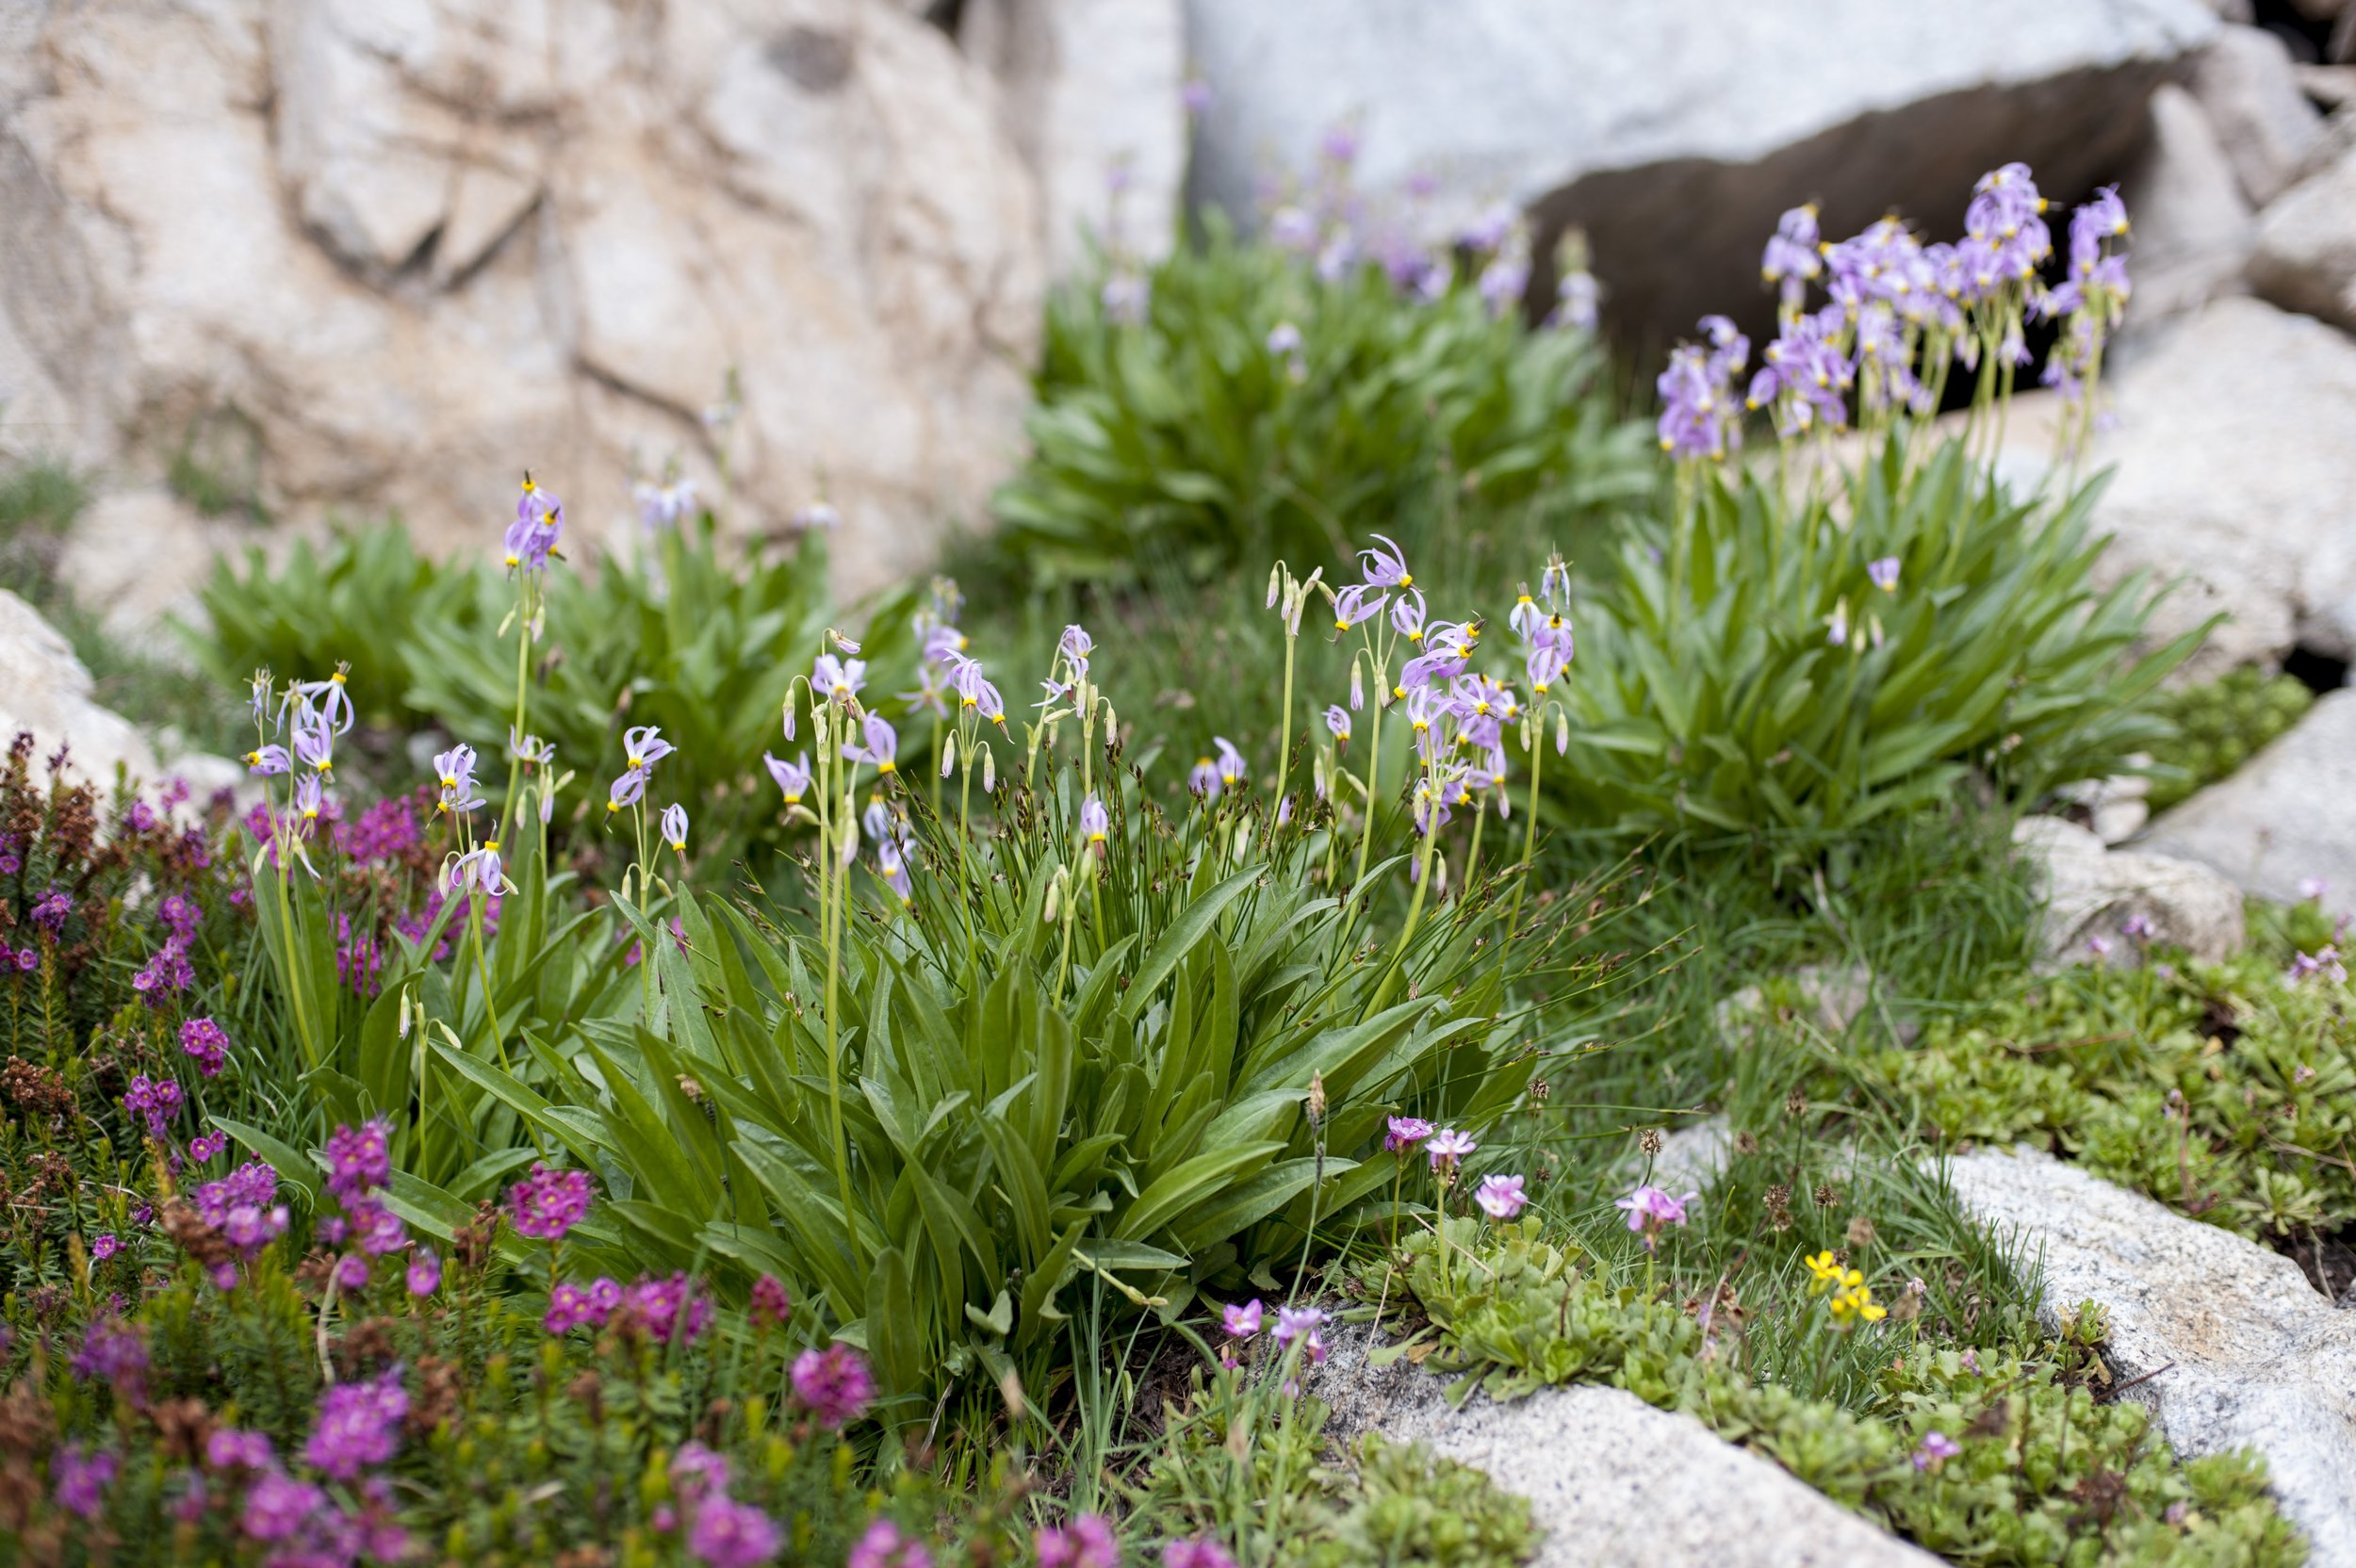 Sierra shooting stars and other high Sierra flowers.